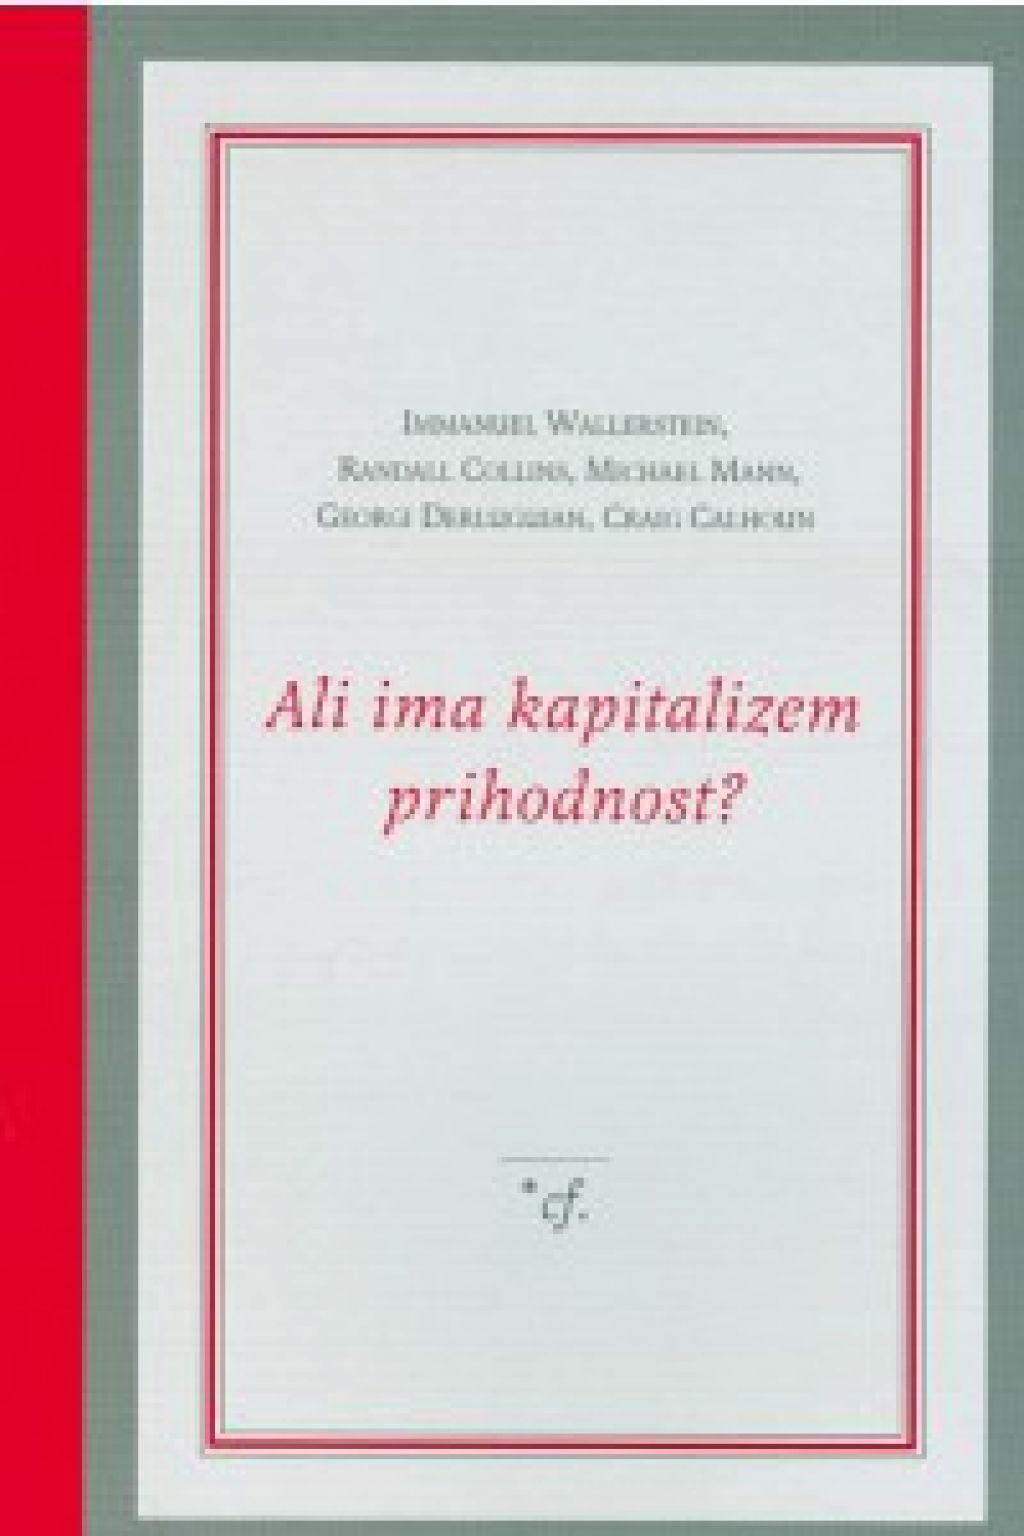 Recenzija knjige: Strukturno določena prihodnost